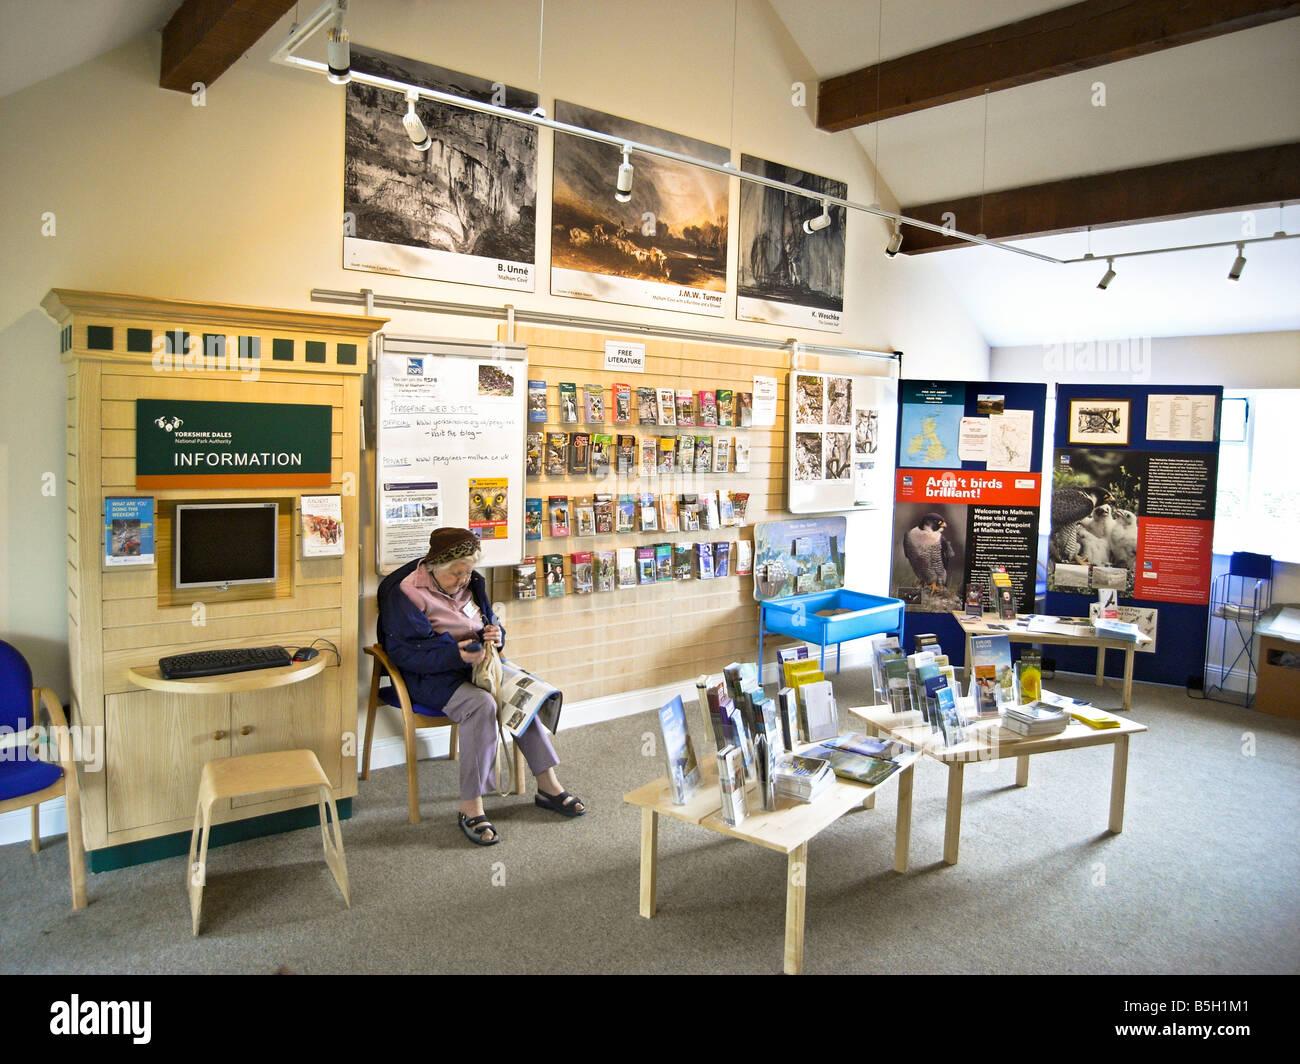 Inside the information centre at Malham Yorkshire England UK EU - Stock Image